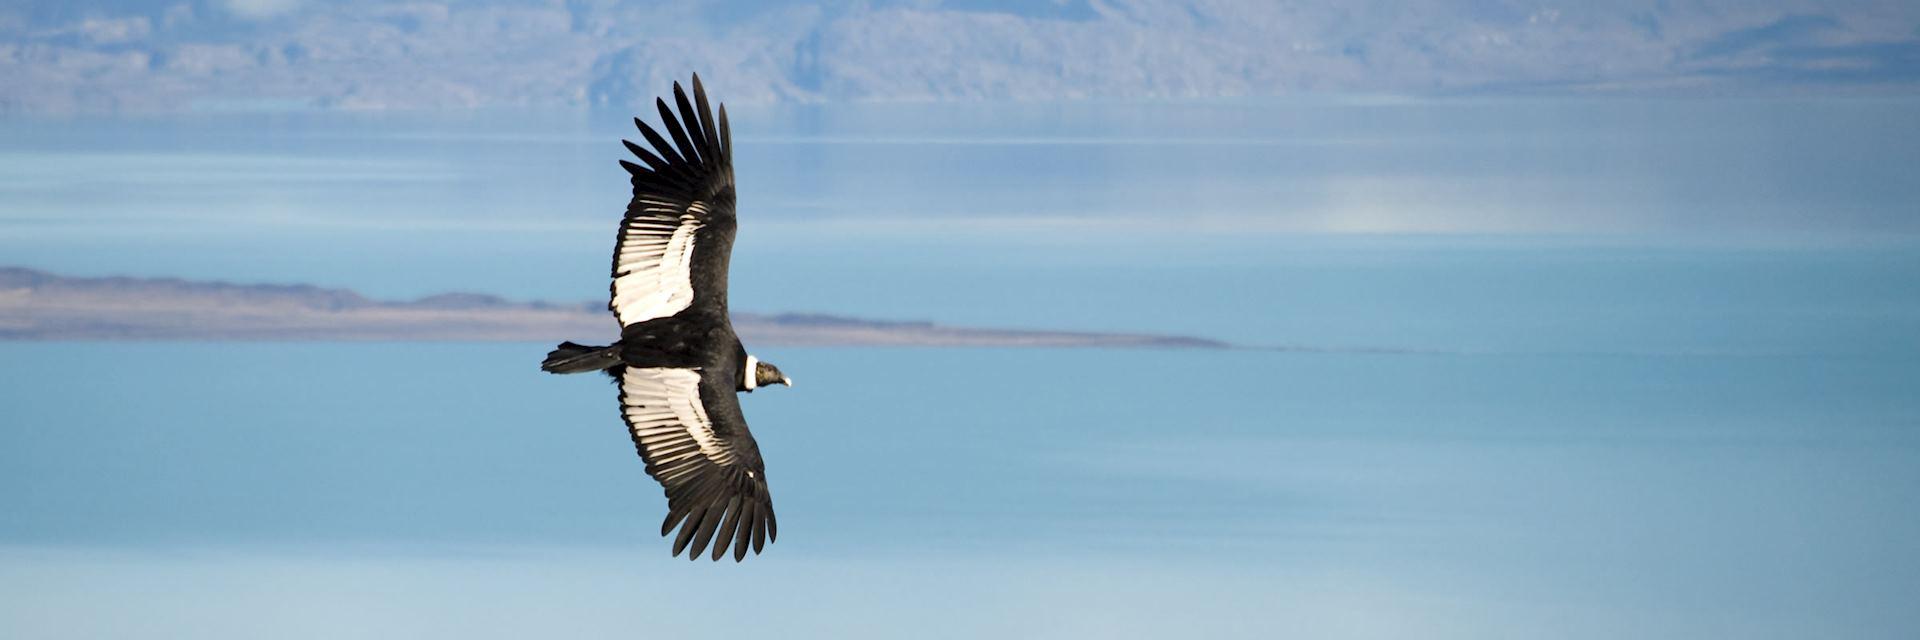 Patagonian condor, Argentina